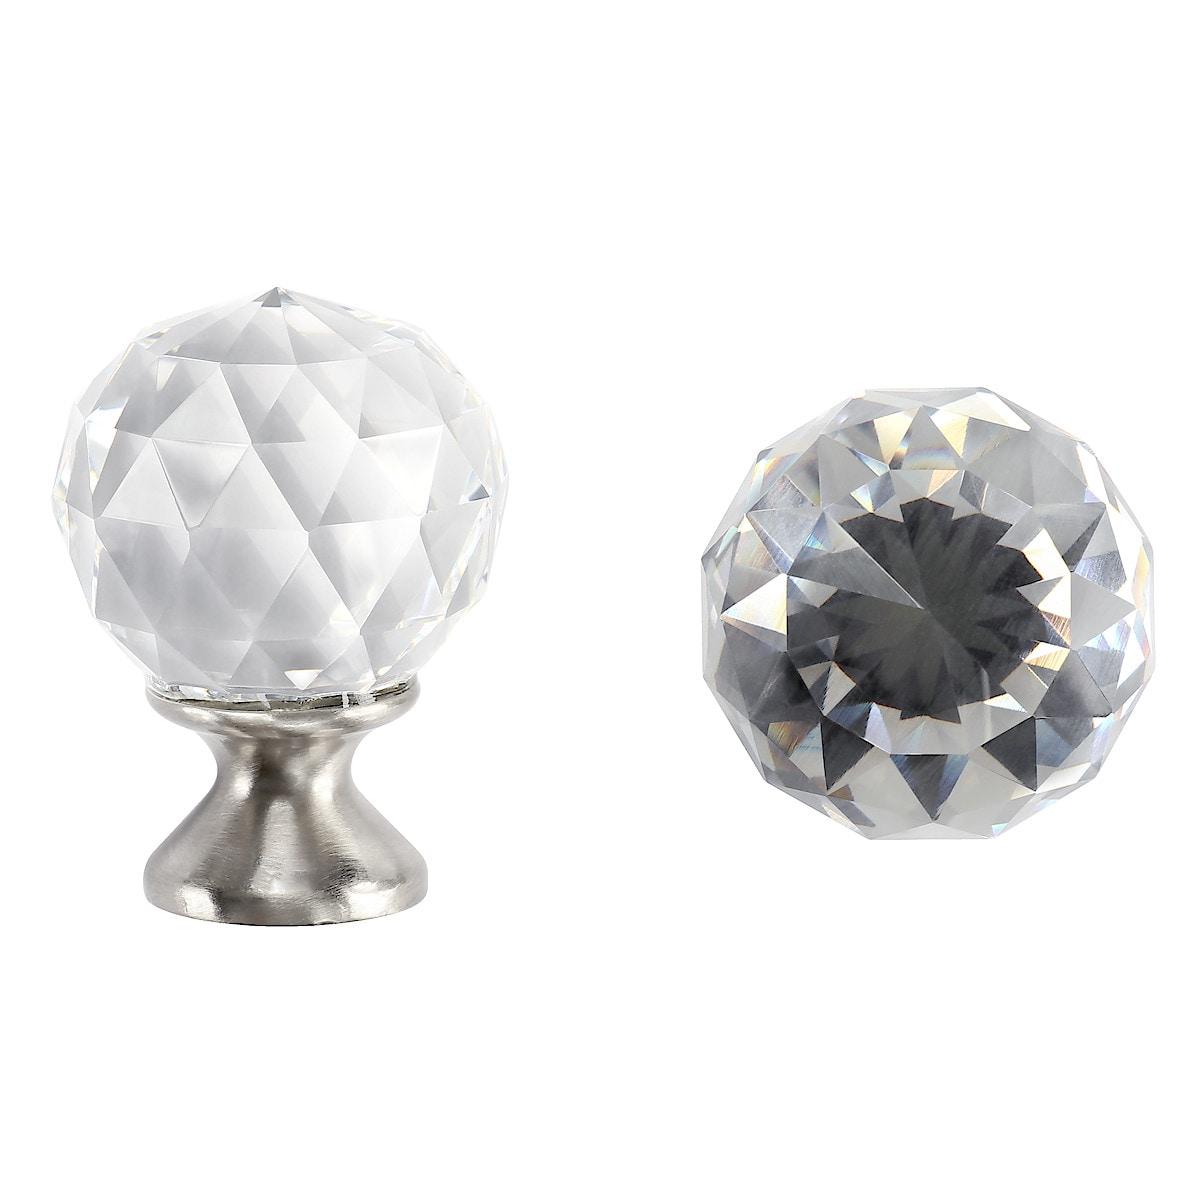 Knopp Kristall